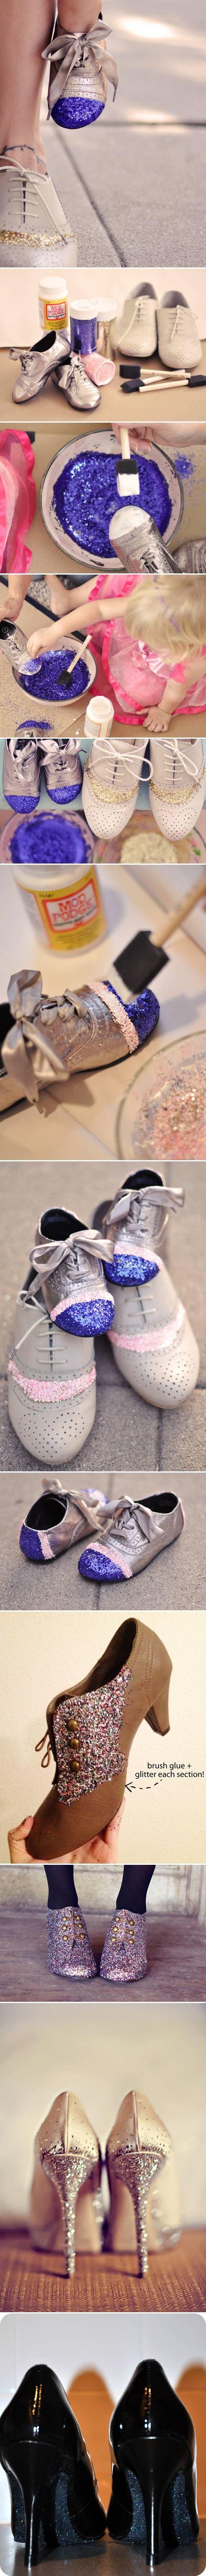 DIY Easy Glitter Shoes